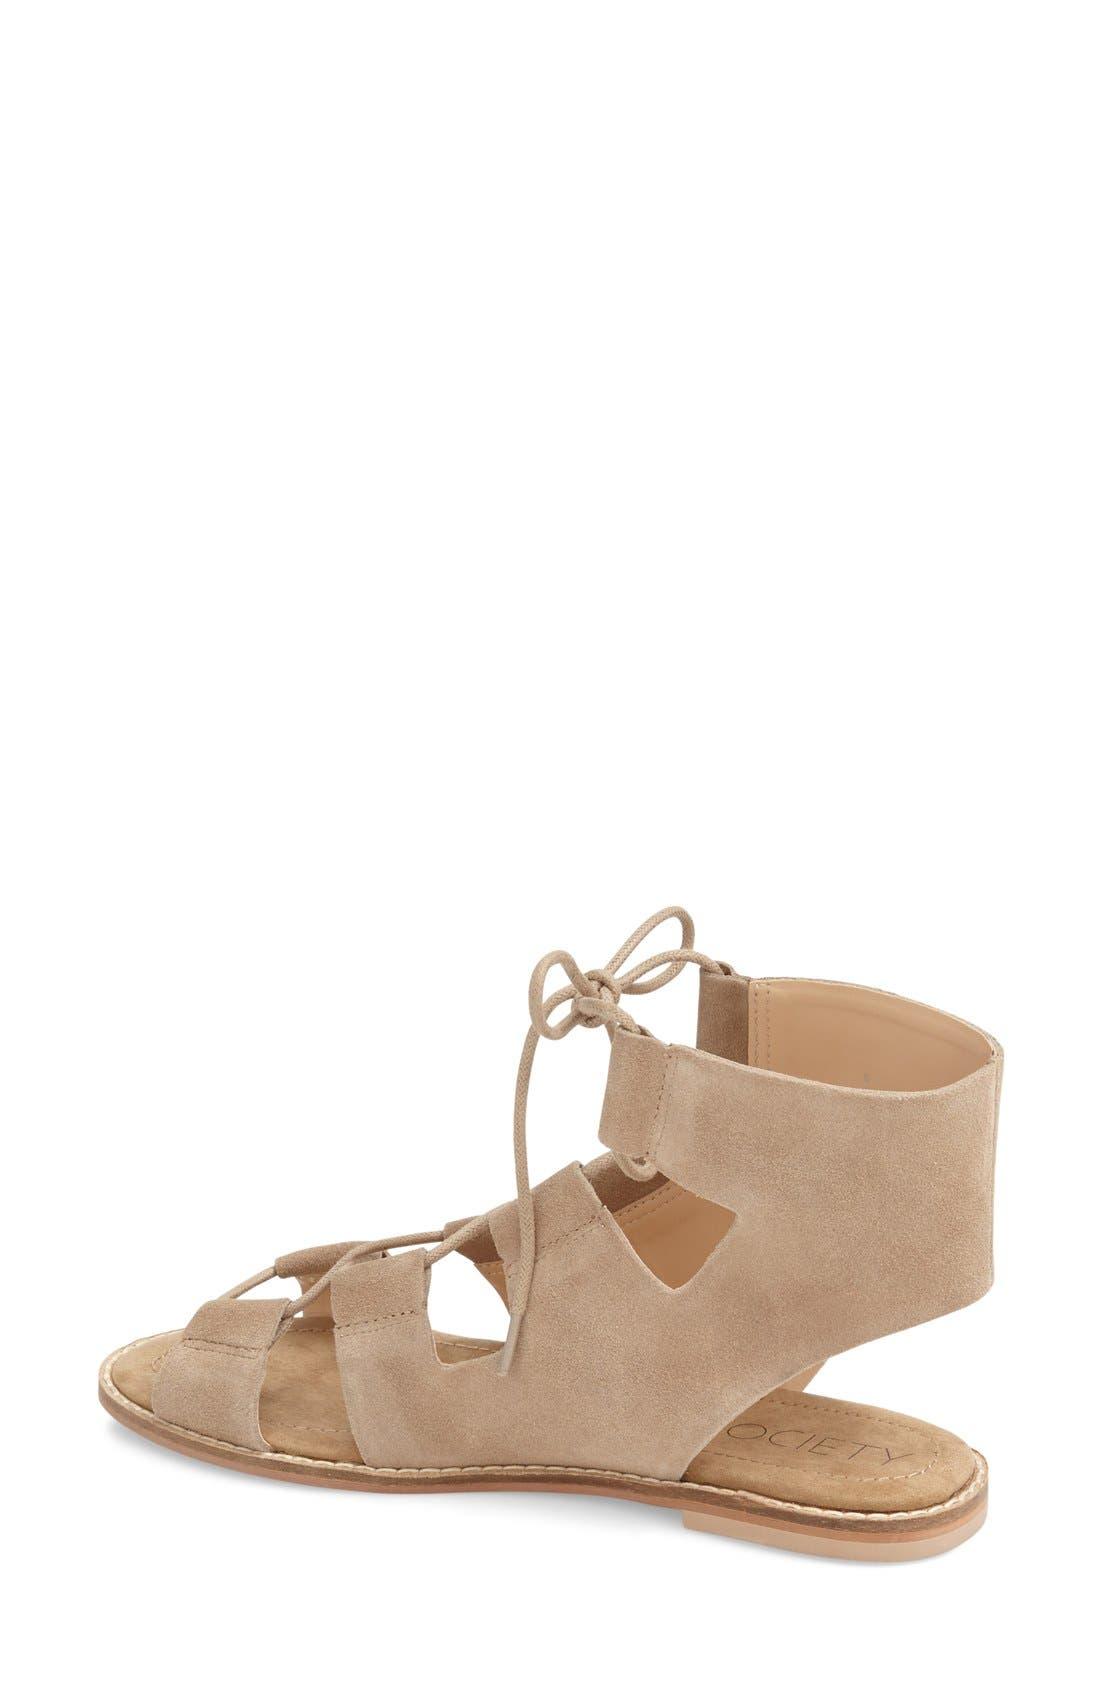 'Cady' Lace-Up Flat Sandal,                             Alternate thumbnail 14, color,